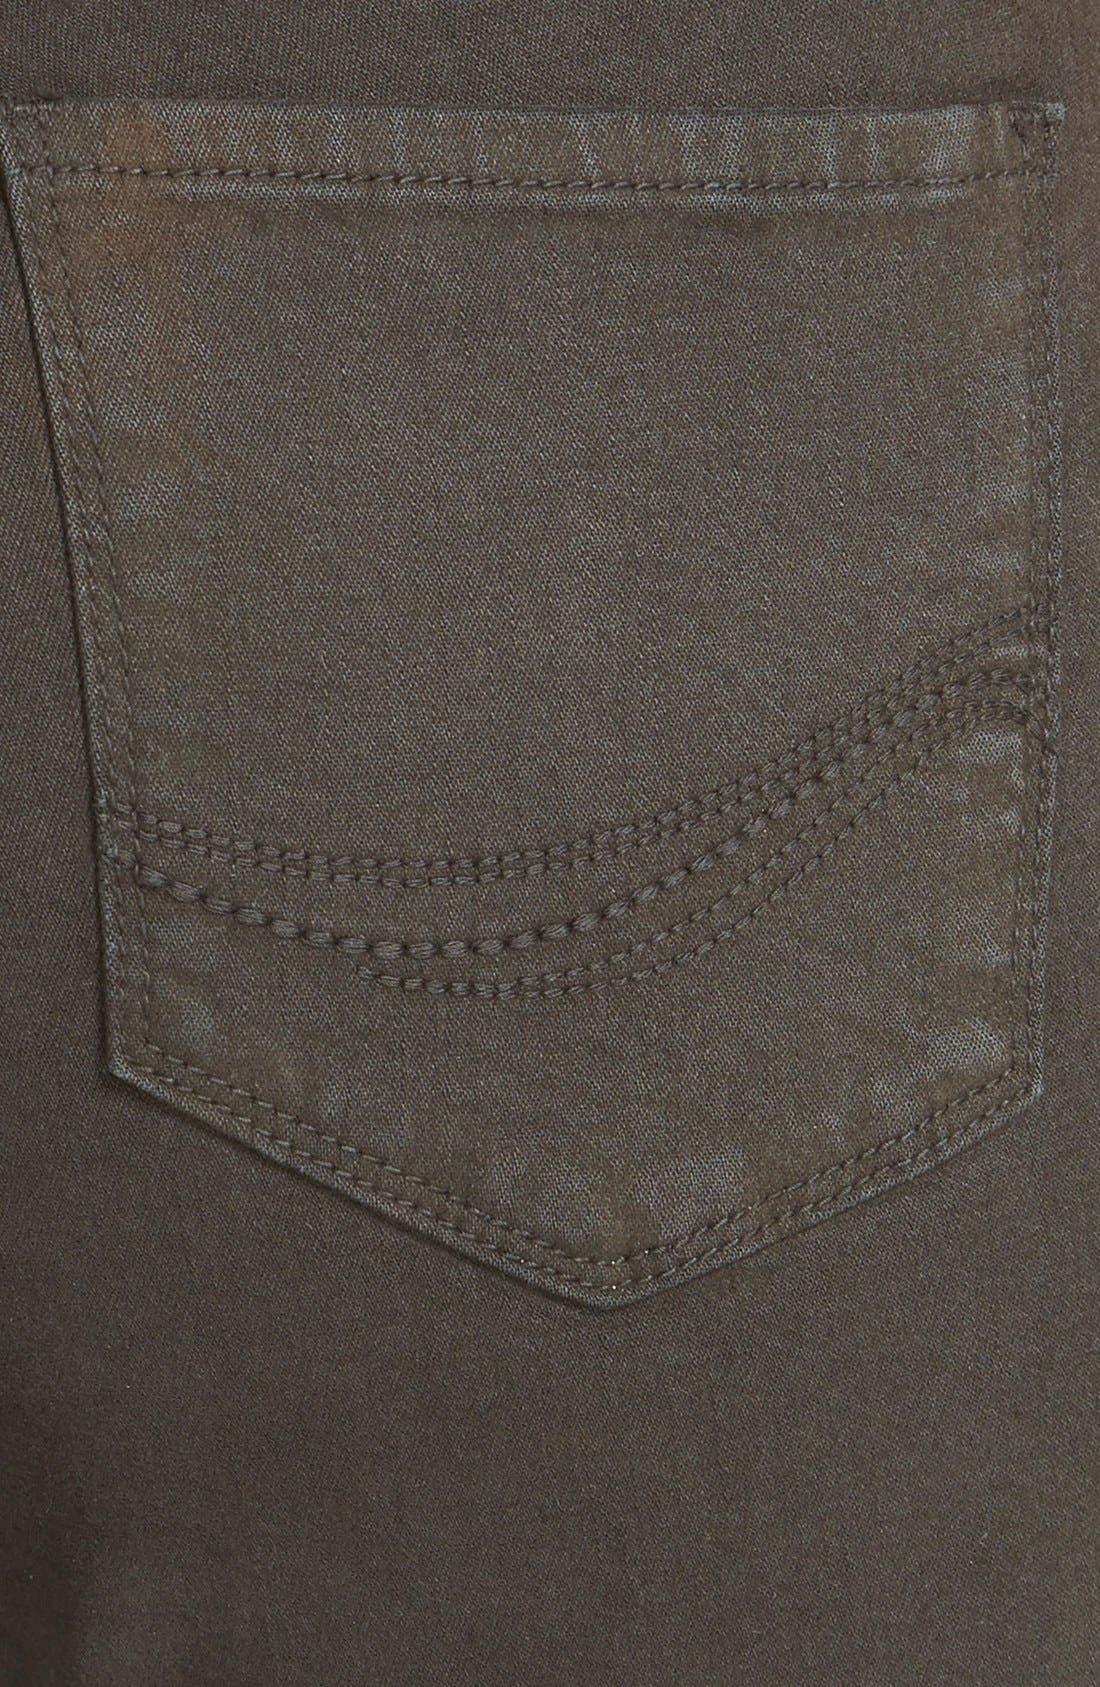 Alternate Image 3  - NYDJ Sheri Colored Stretch Skinny Jeans (Petite)